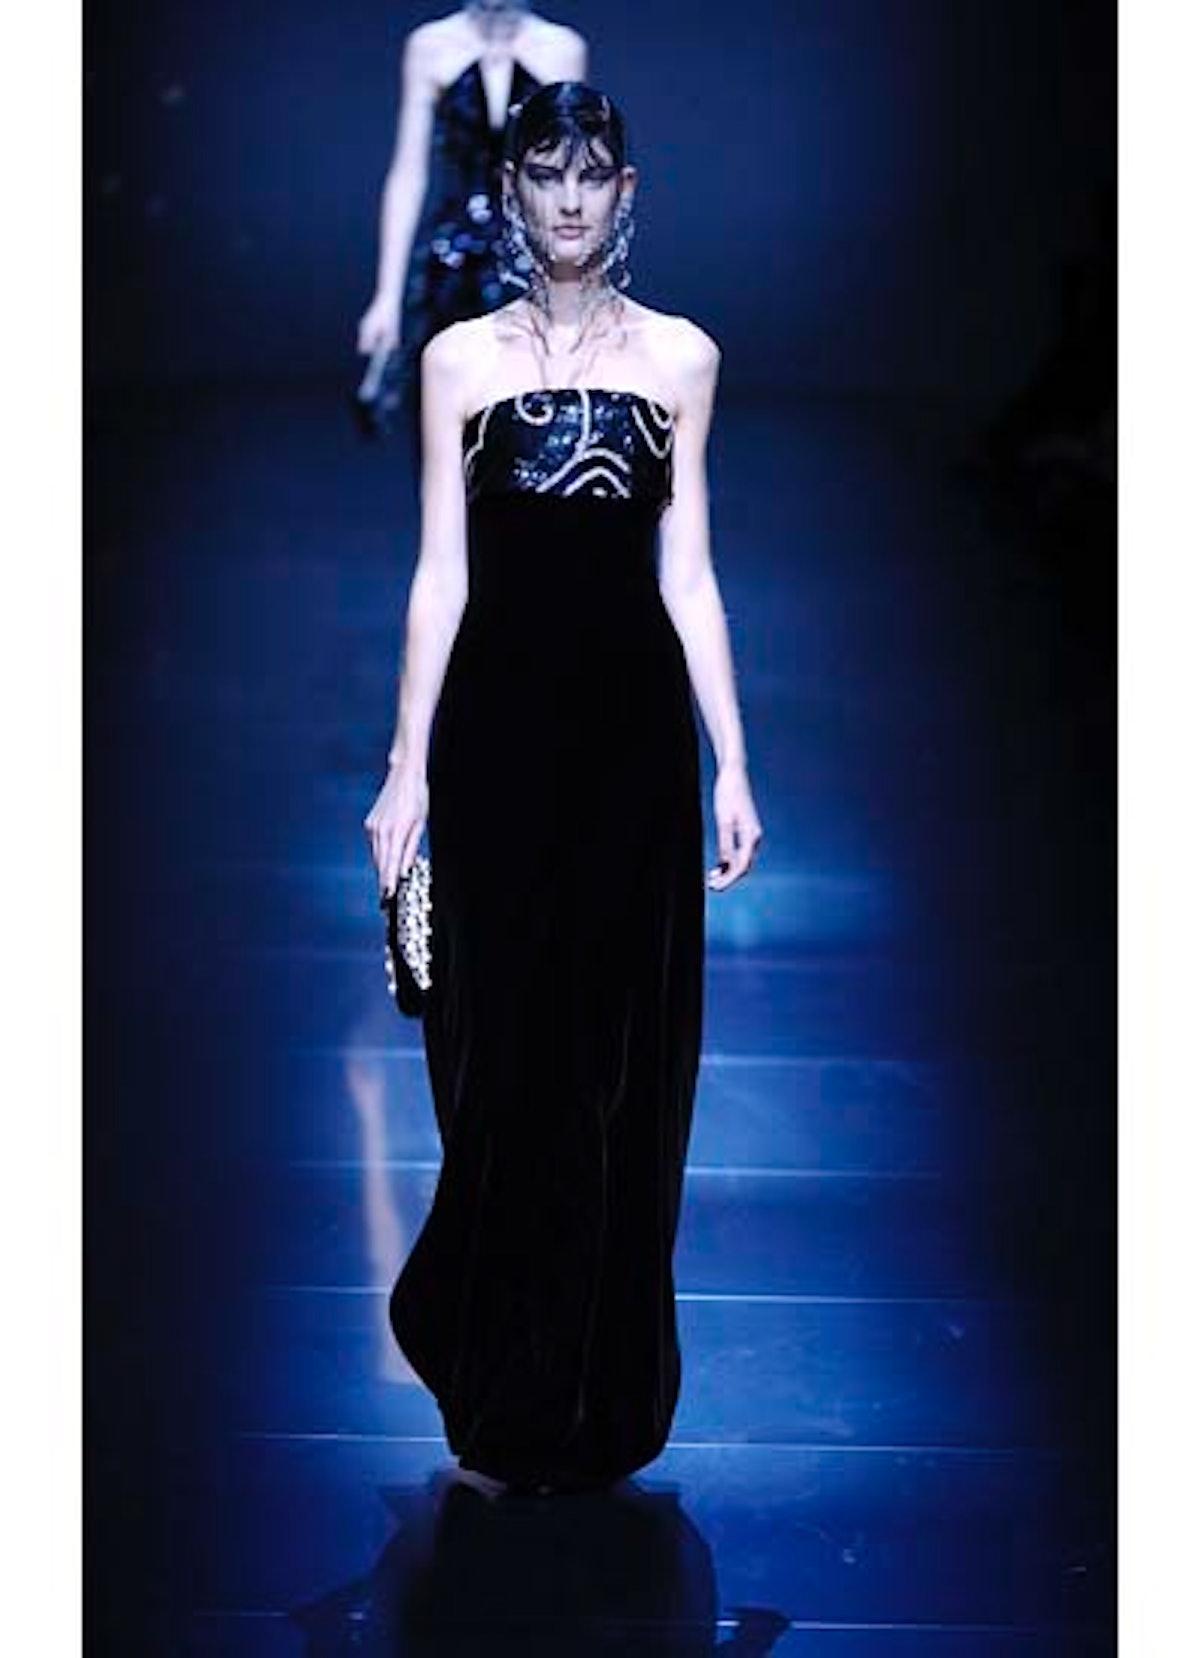 fass-giorgio-armani-couture-2012-runway-49-v.jpg